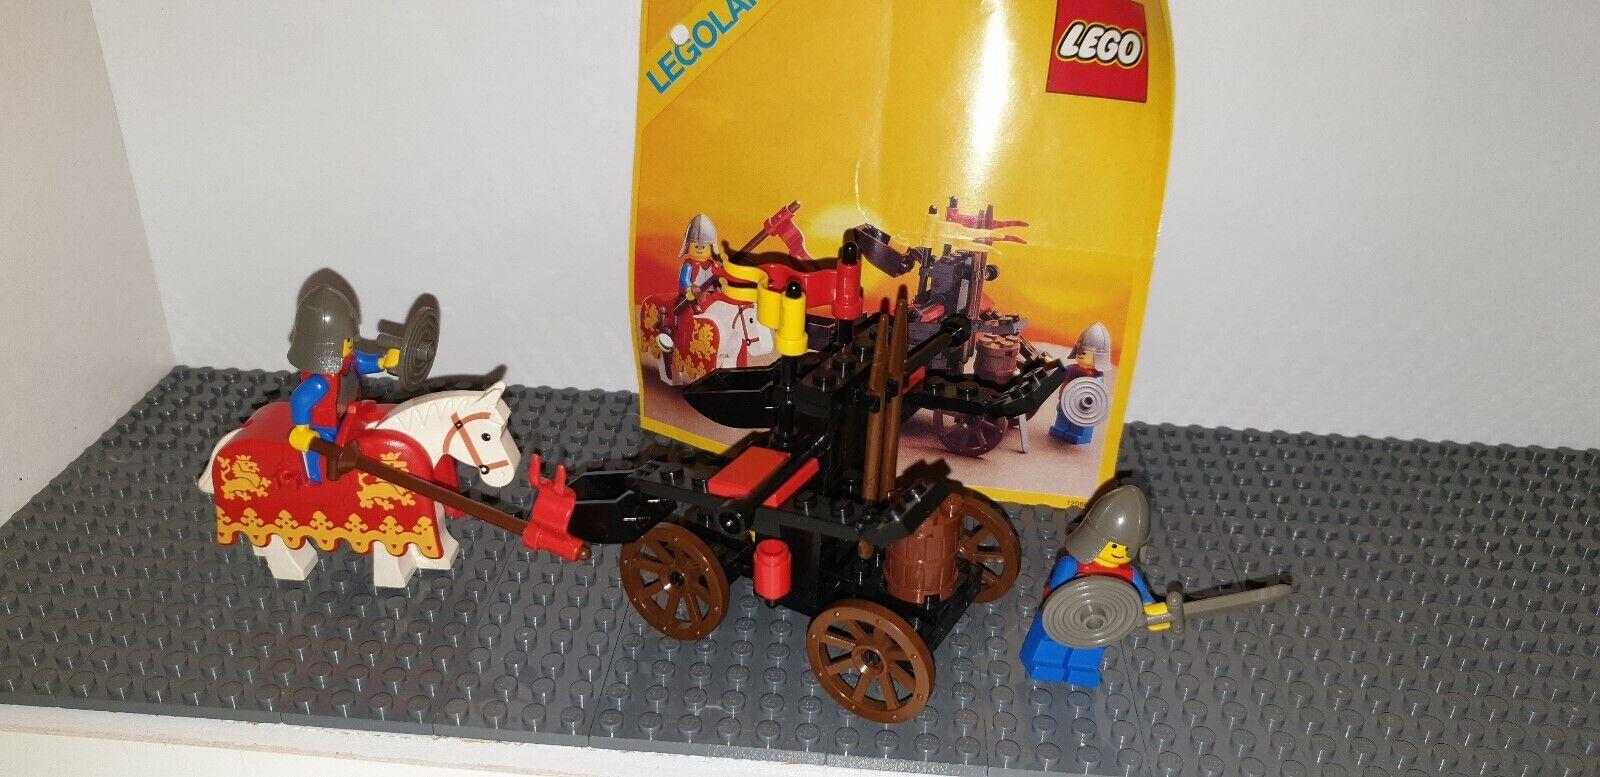 Lego Lego Lego Catsle Set 6039 Zwillingskatapult der Löwenritter 5ca4bd